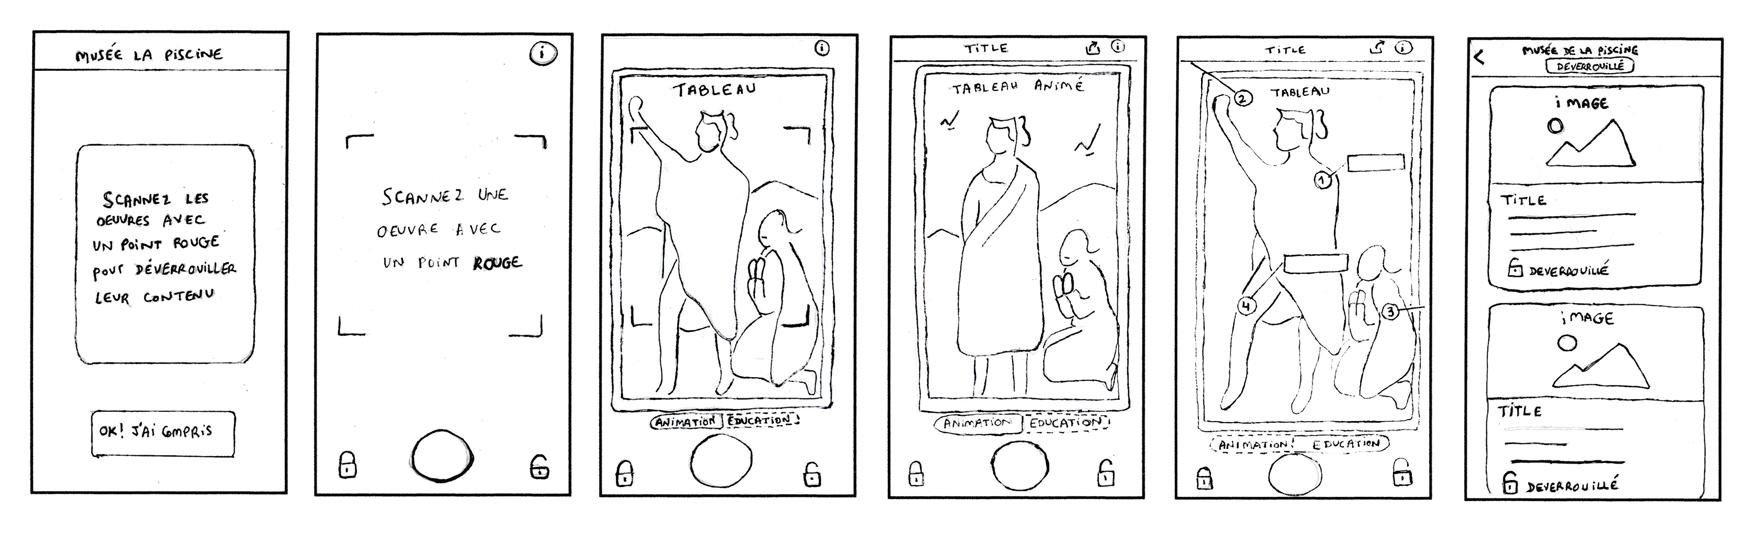 artenpik sketch